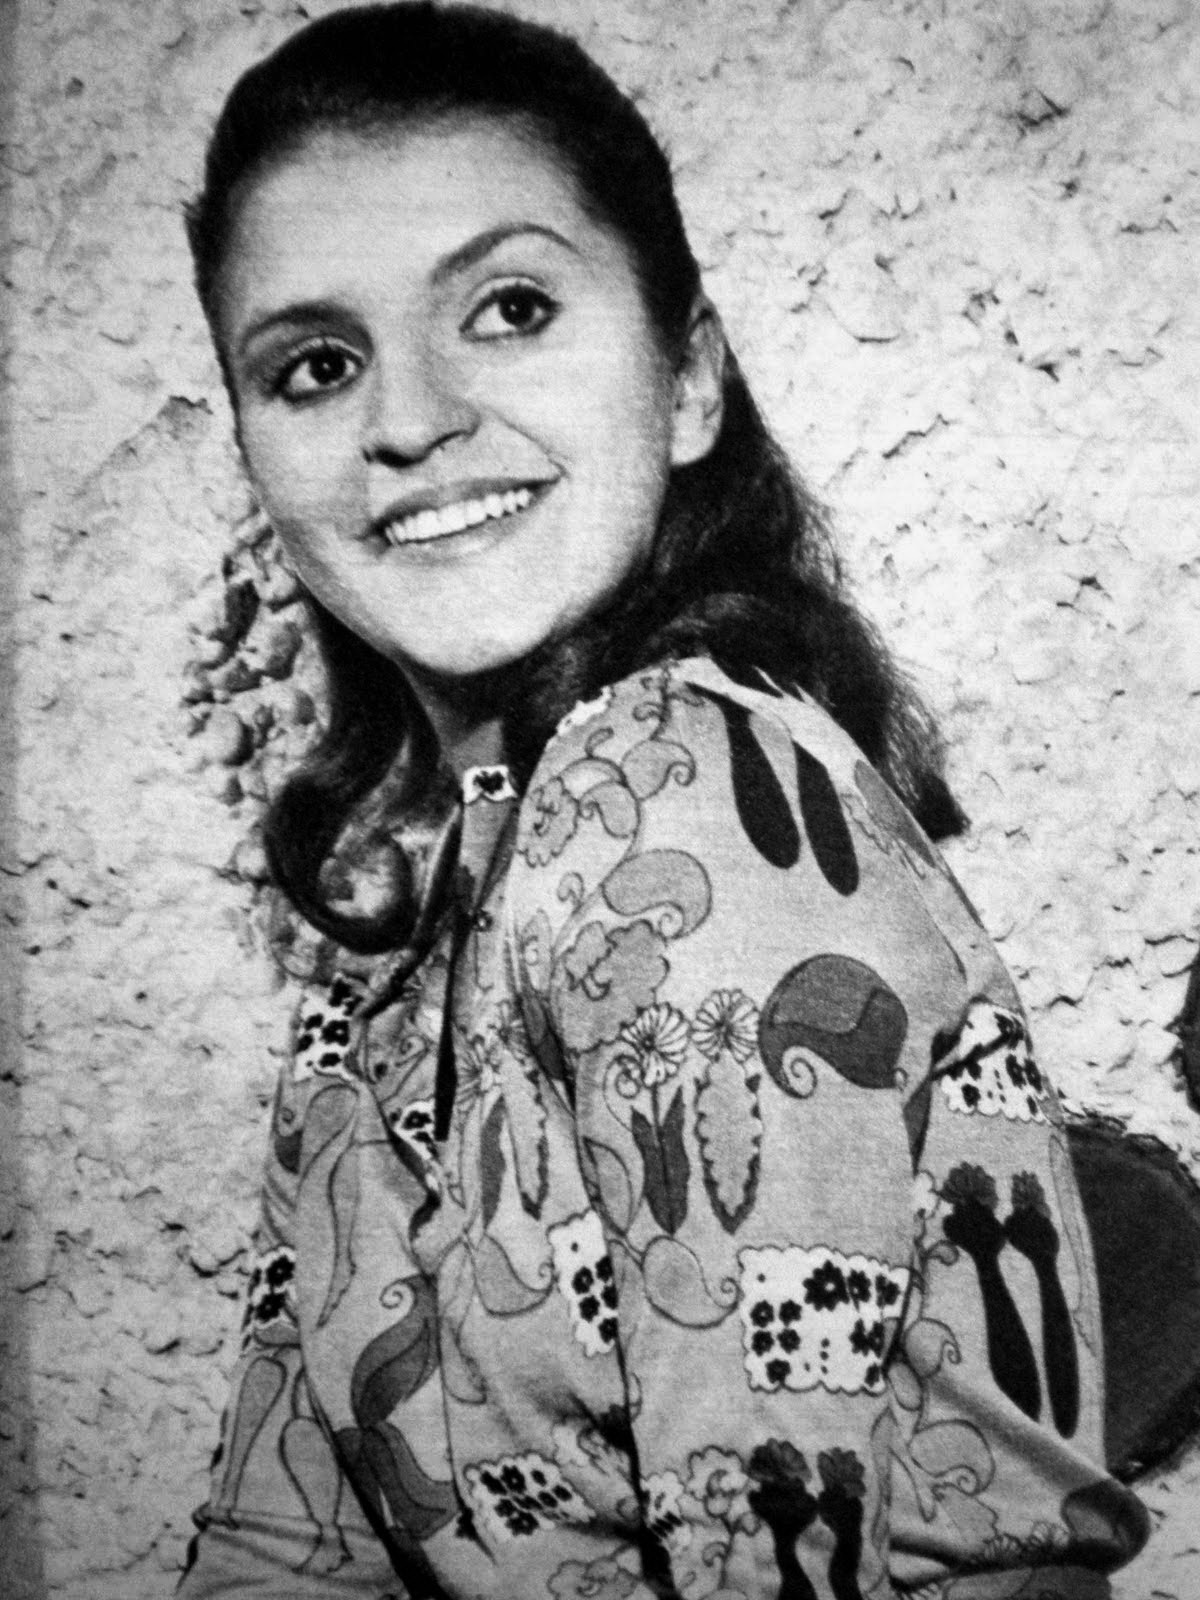 Leila Pinheiro - Leila Pinheiro